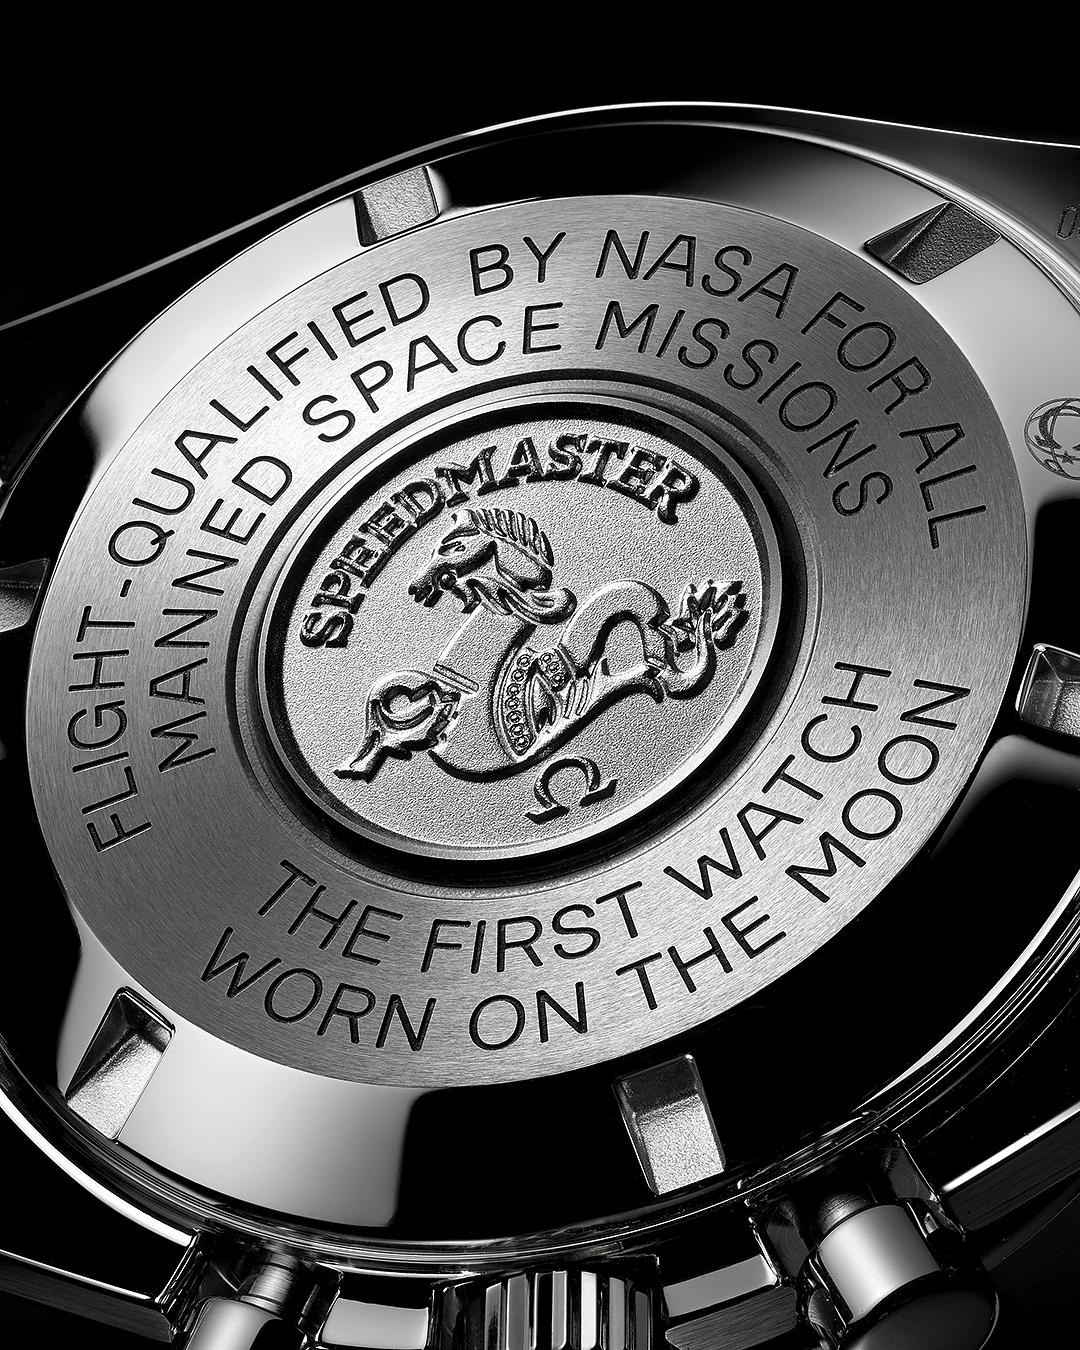 Omega Speedmaster Professional Moonwatch Caseback